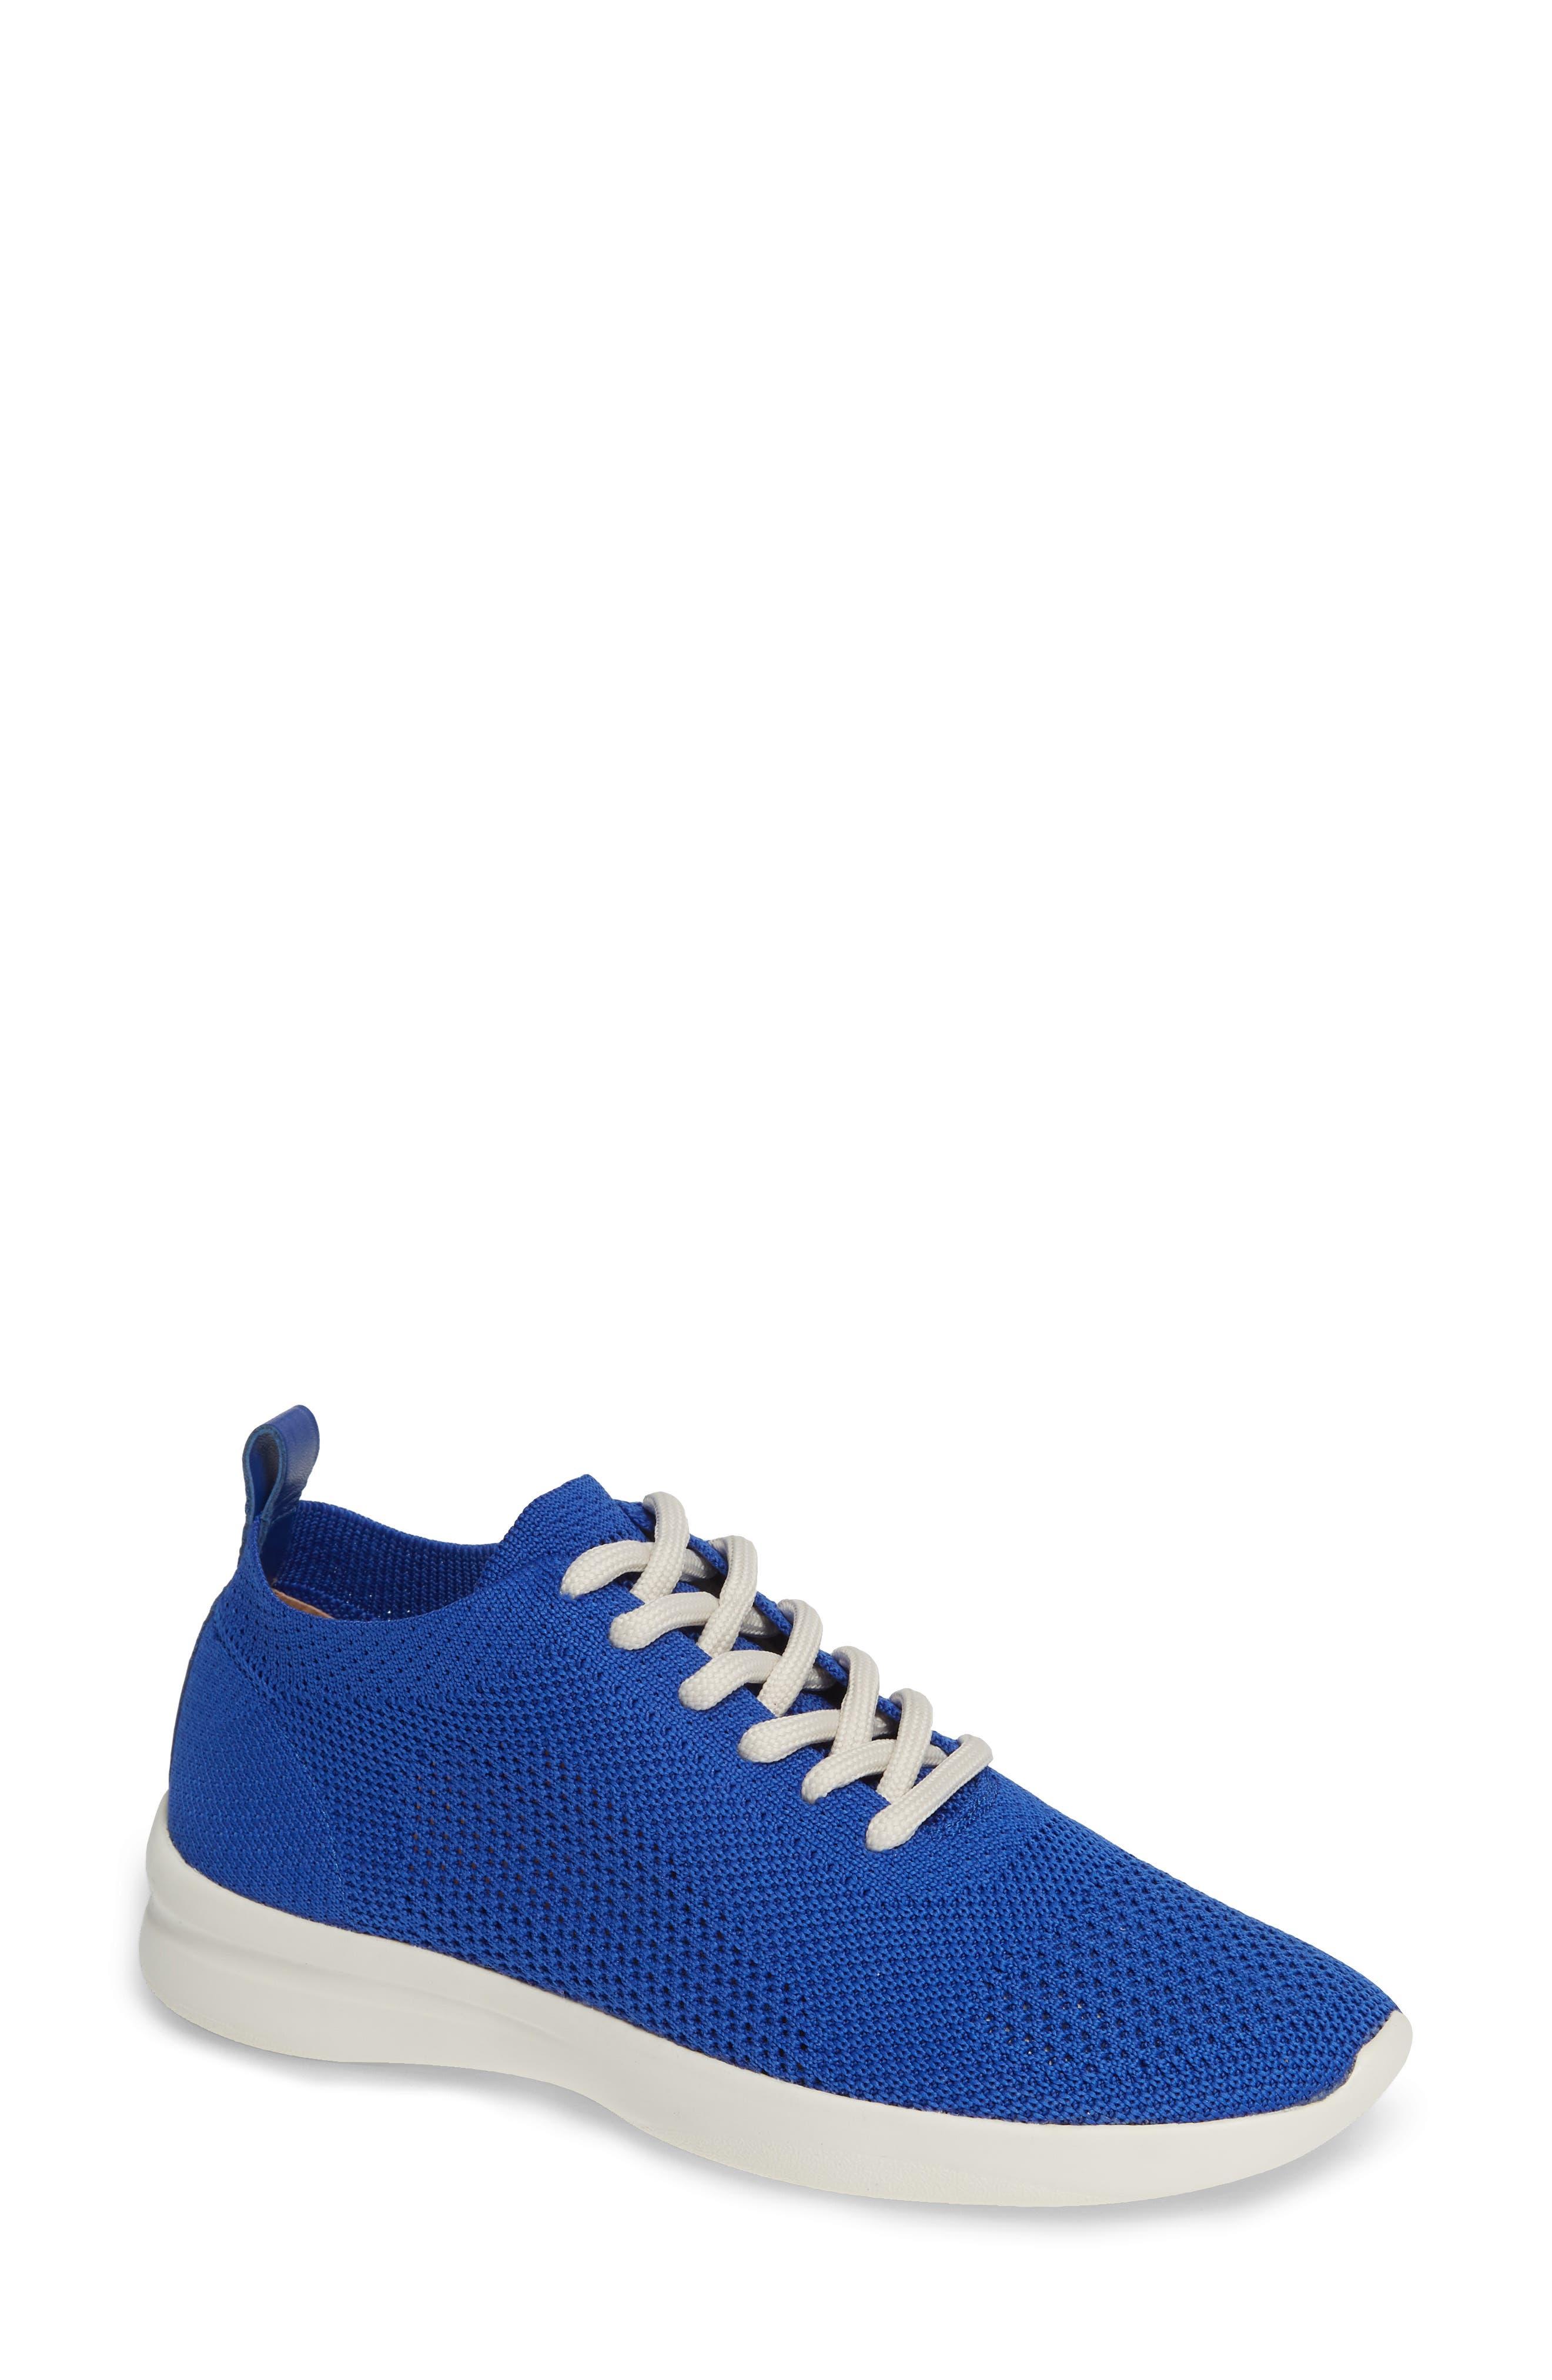 Randee Sneaker,                         Main,                         color, Blue Fabric